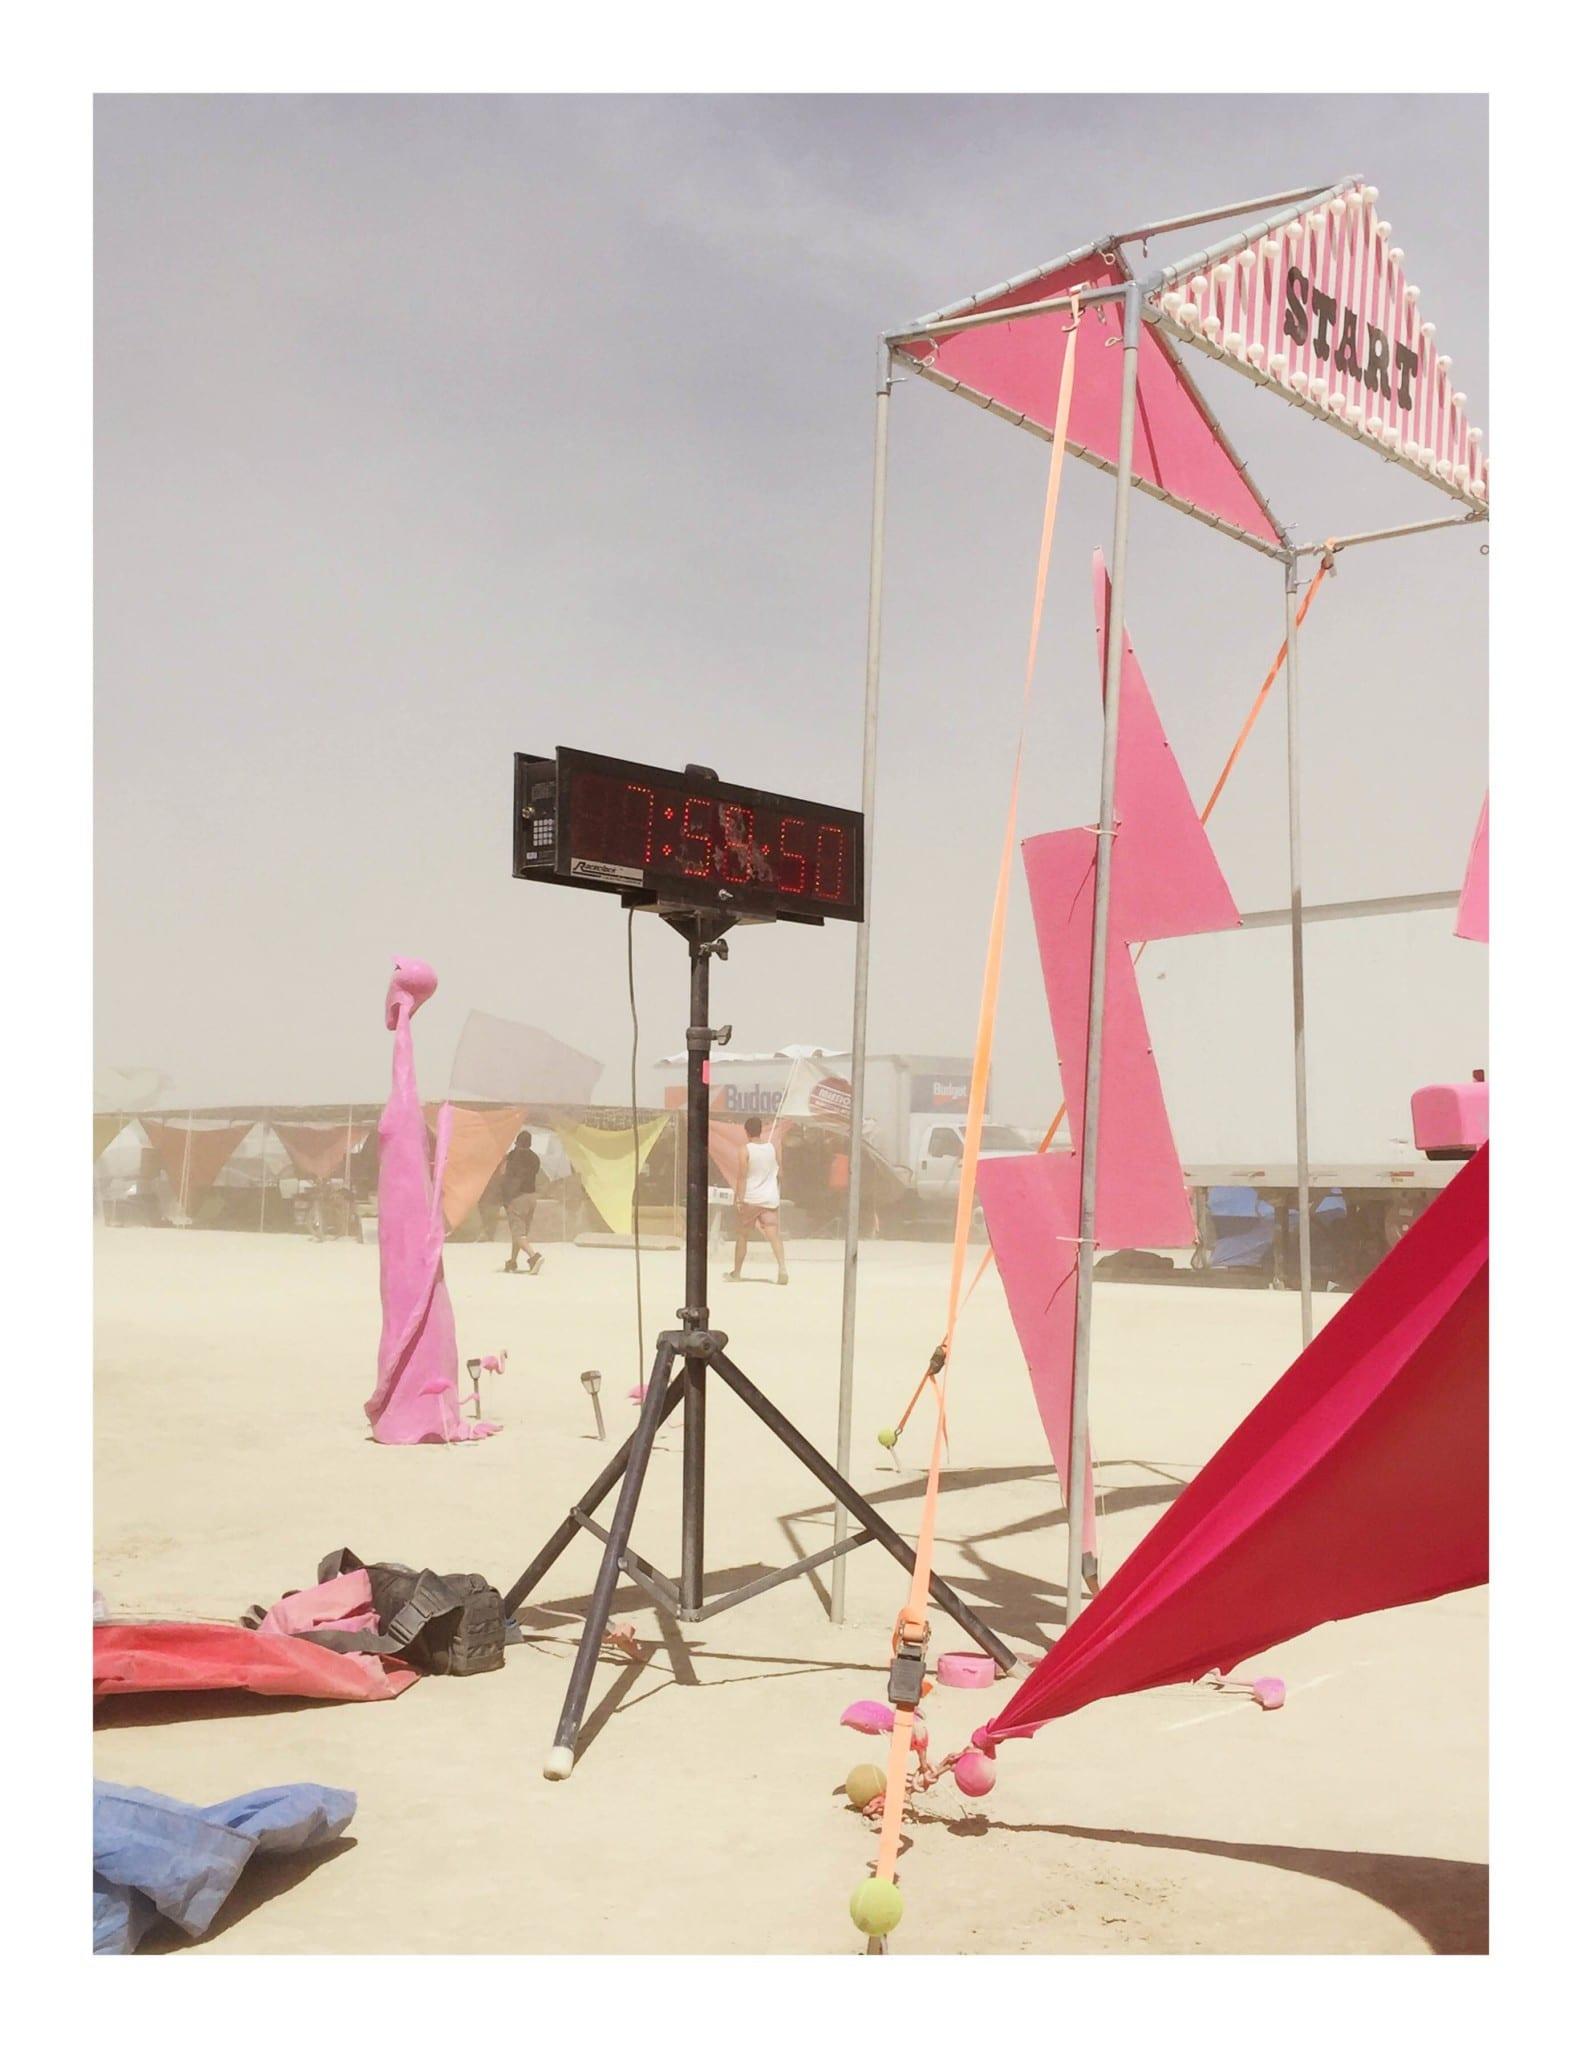 Burning Man Marathon - Timer